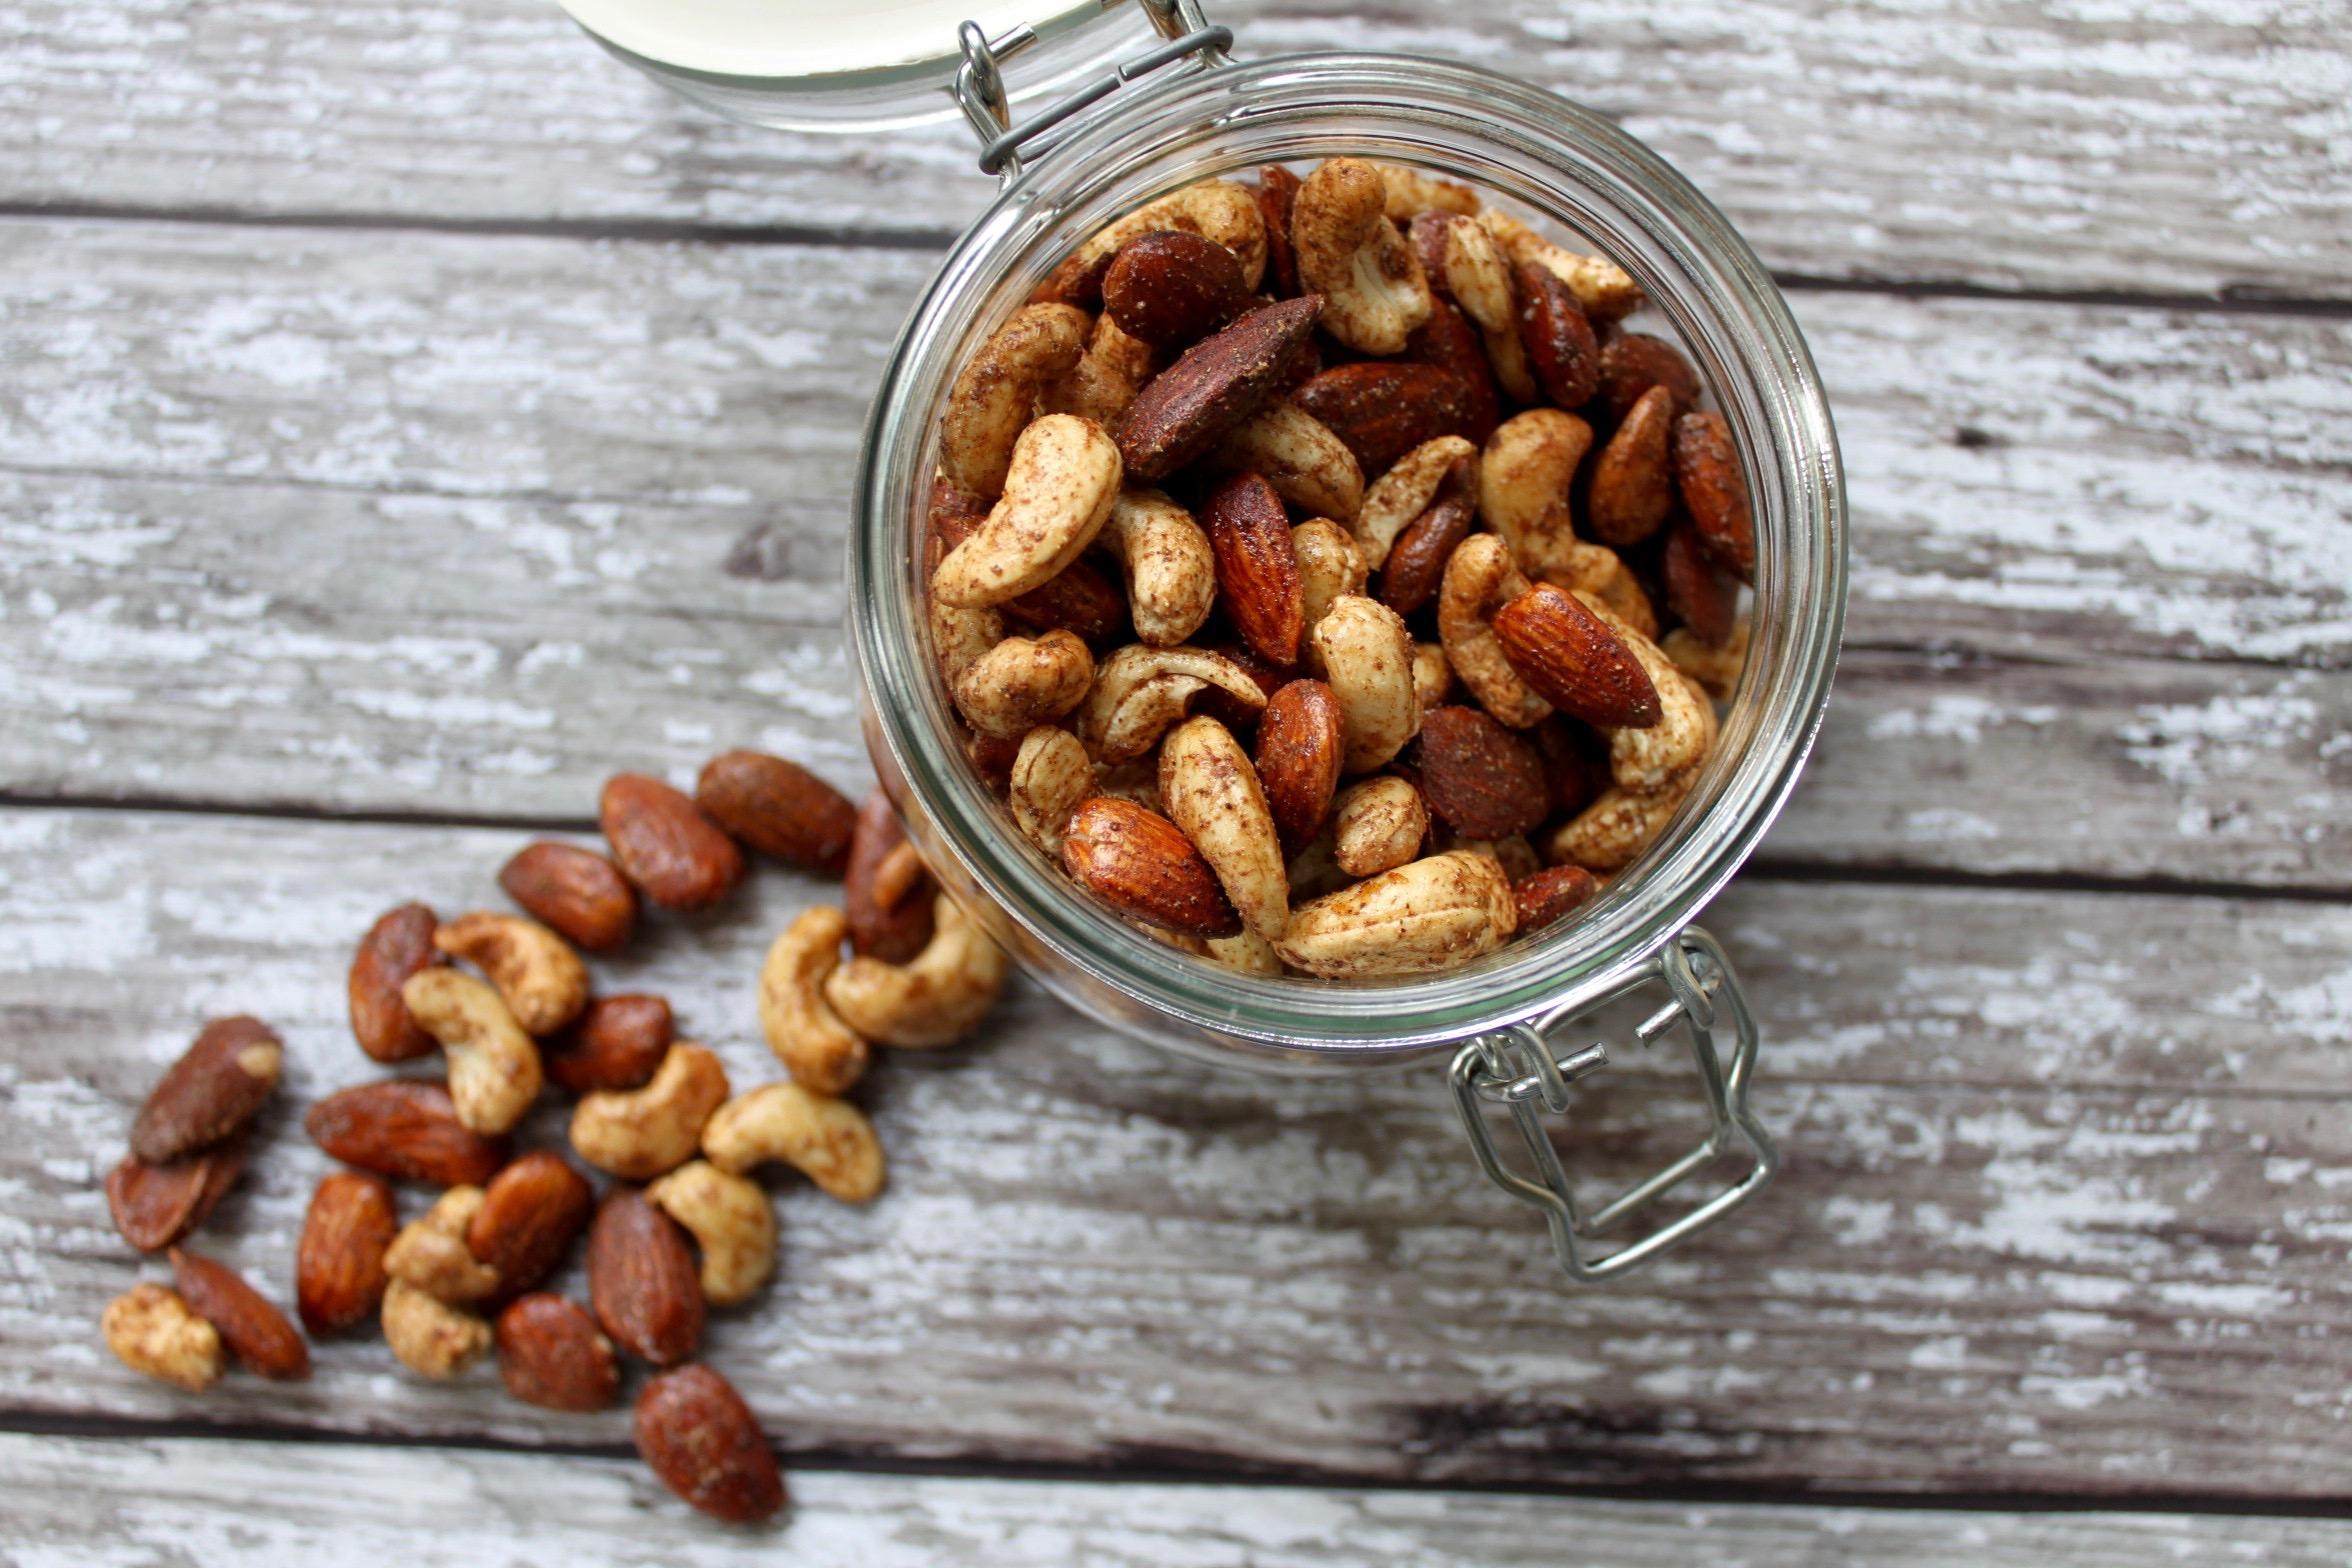 Maple & Five-Spice Roast Nuts